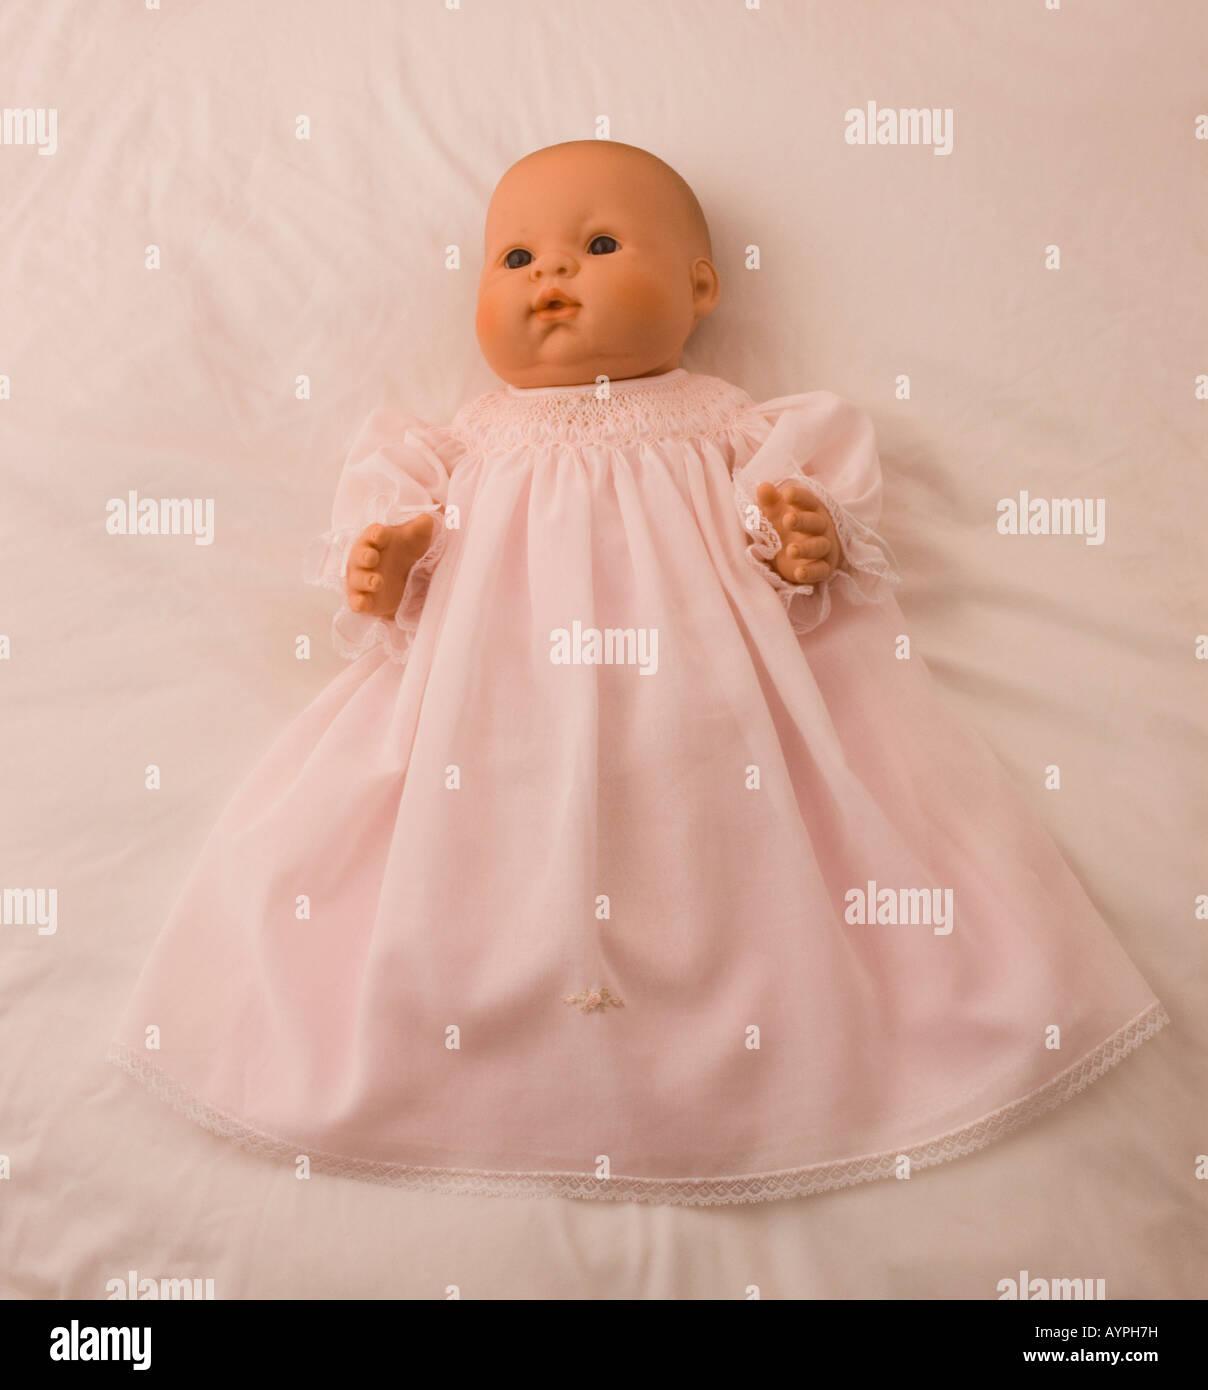 Lifelike Baby Doll Imágenes De Stock & Lifelike Baby Doll Fotos De ...